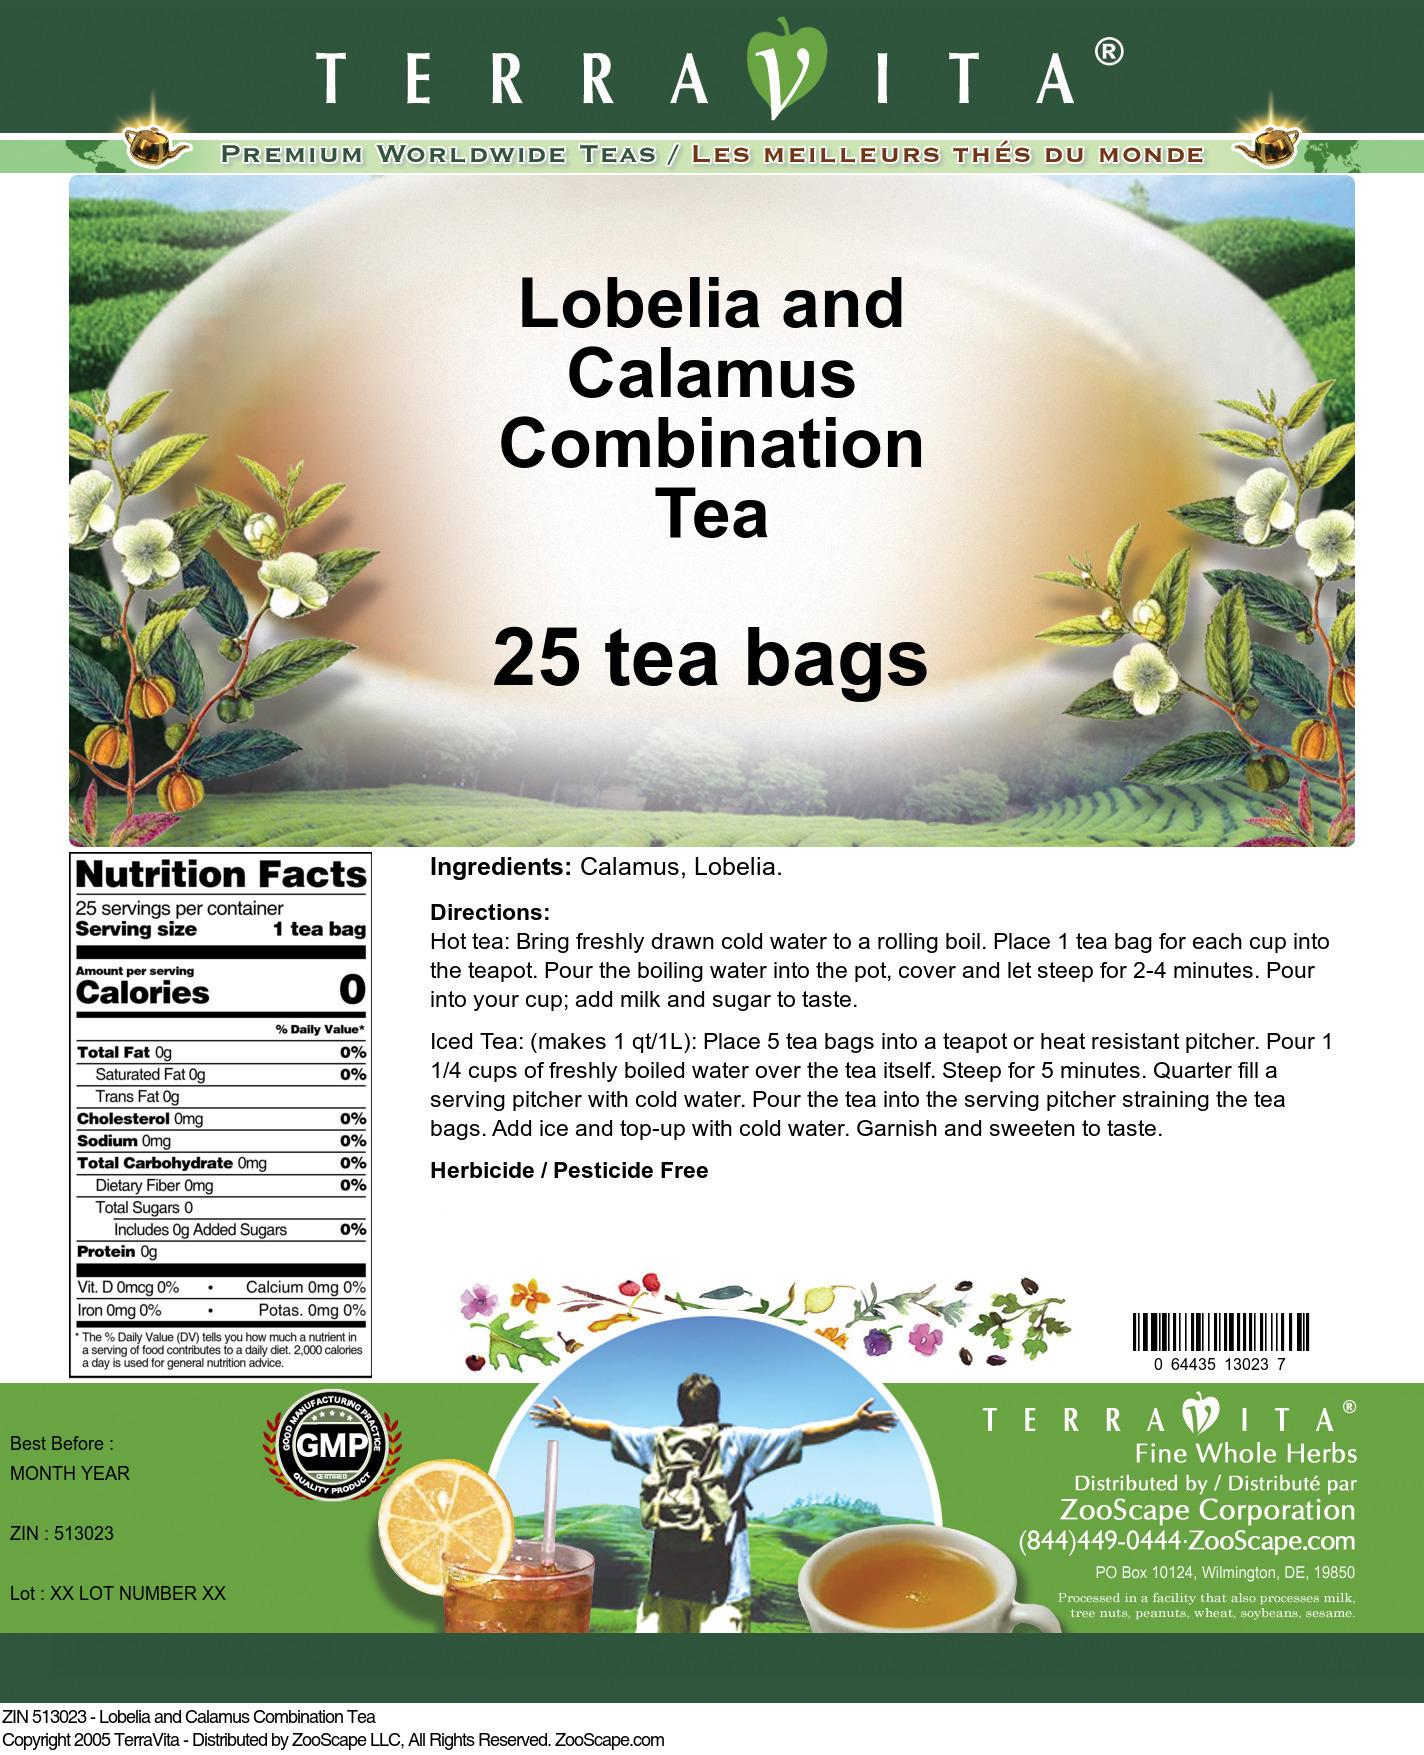 Lobelia and Calamus Combination Tea